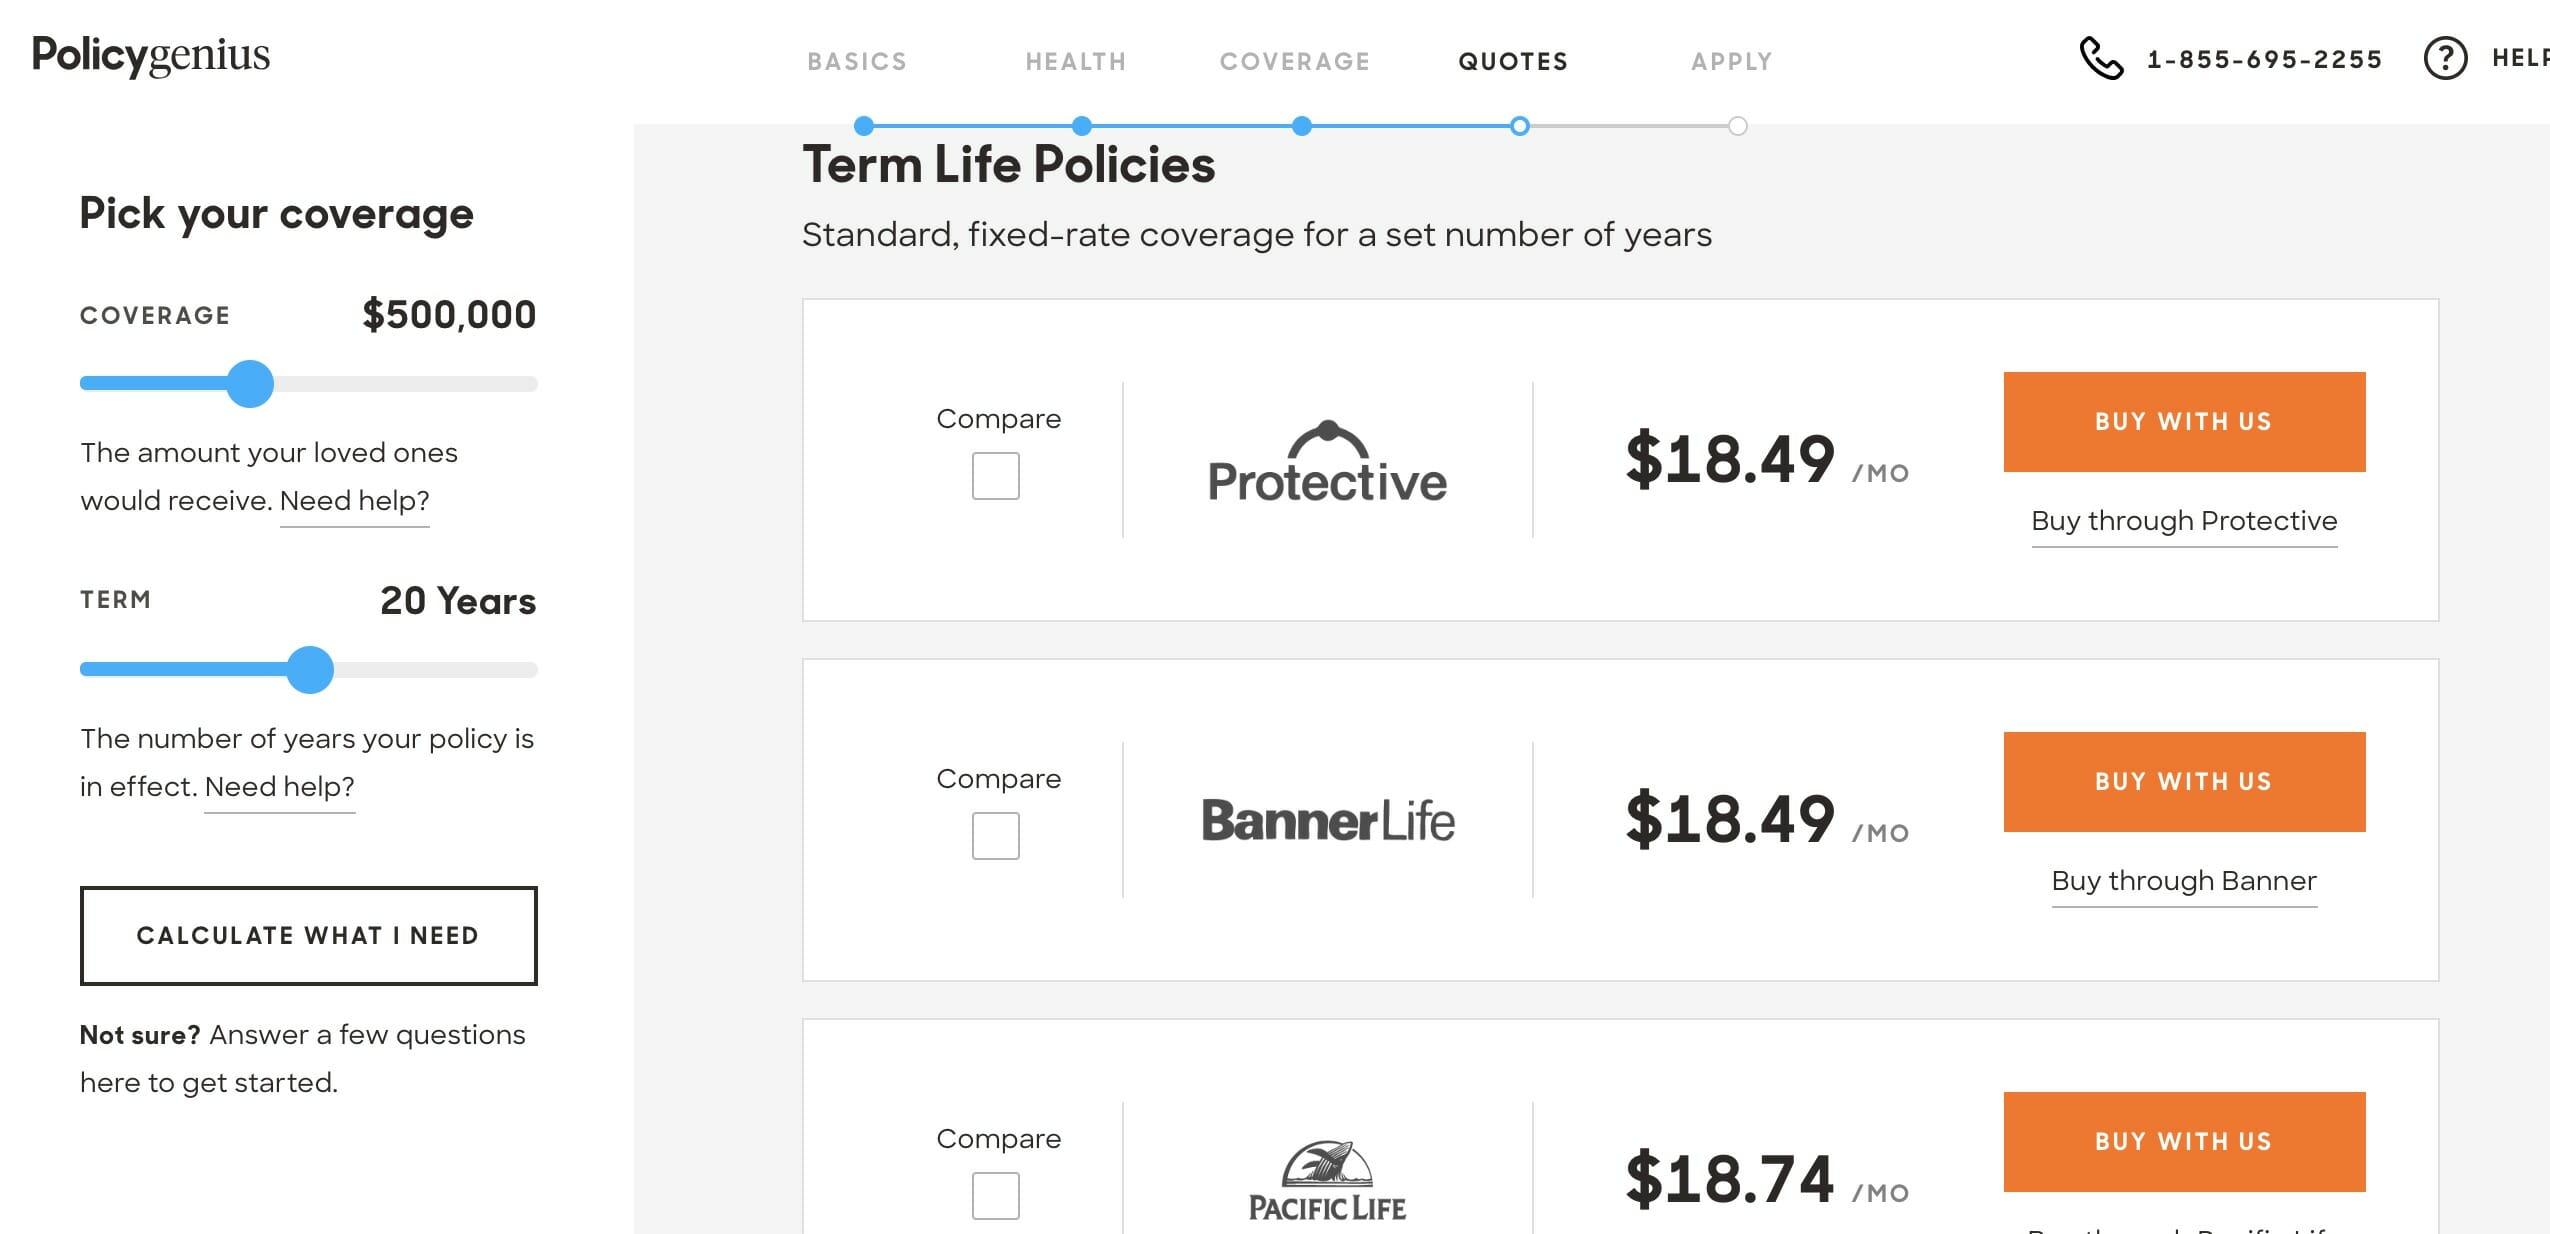 policygenius-life-insurance-quotes